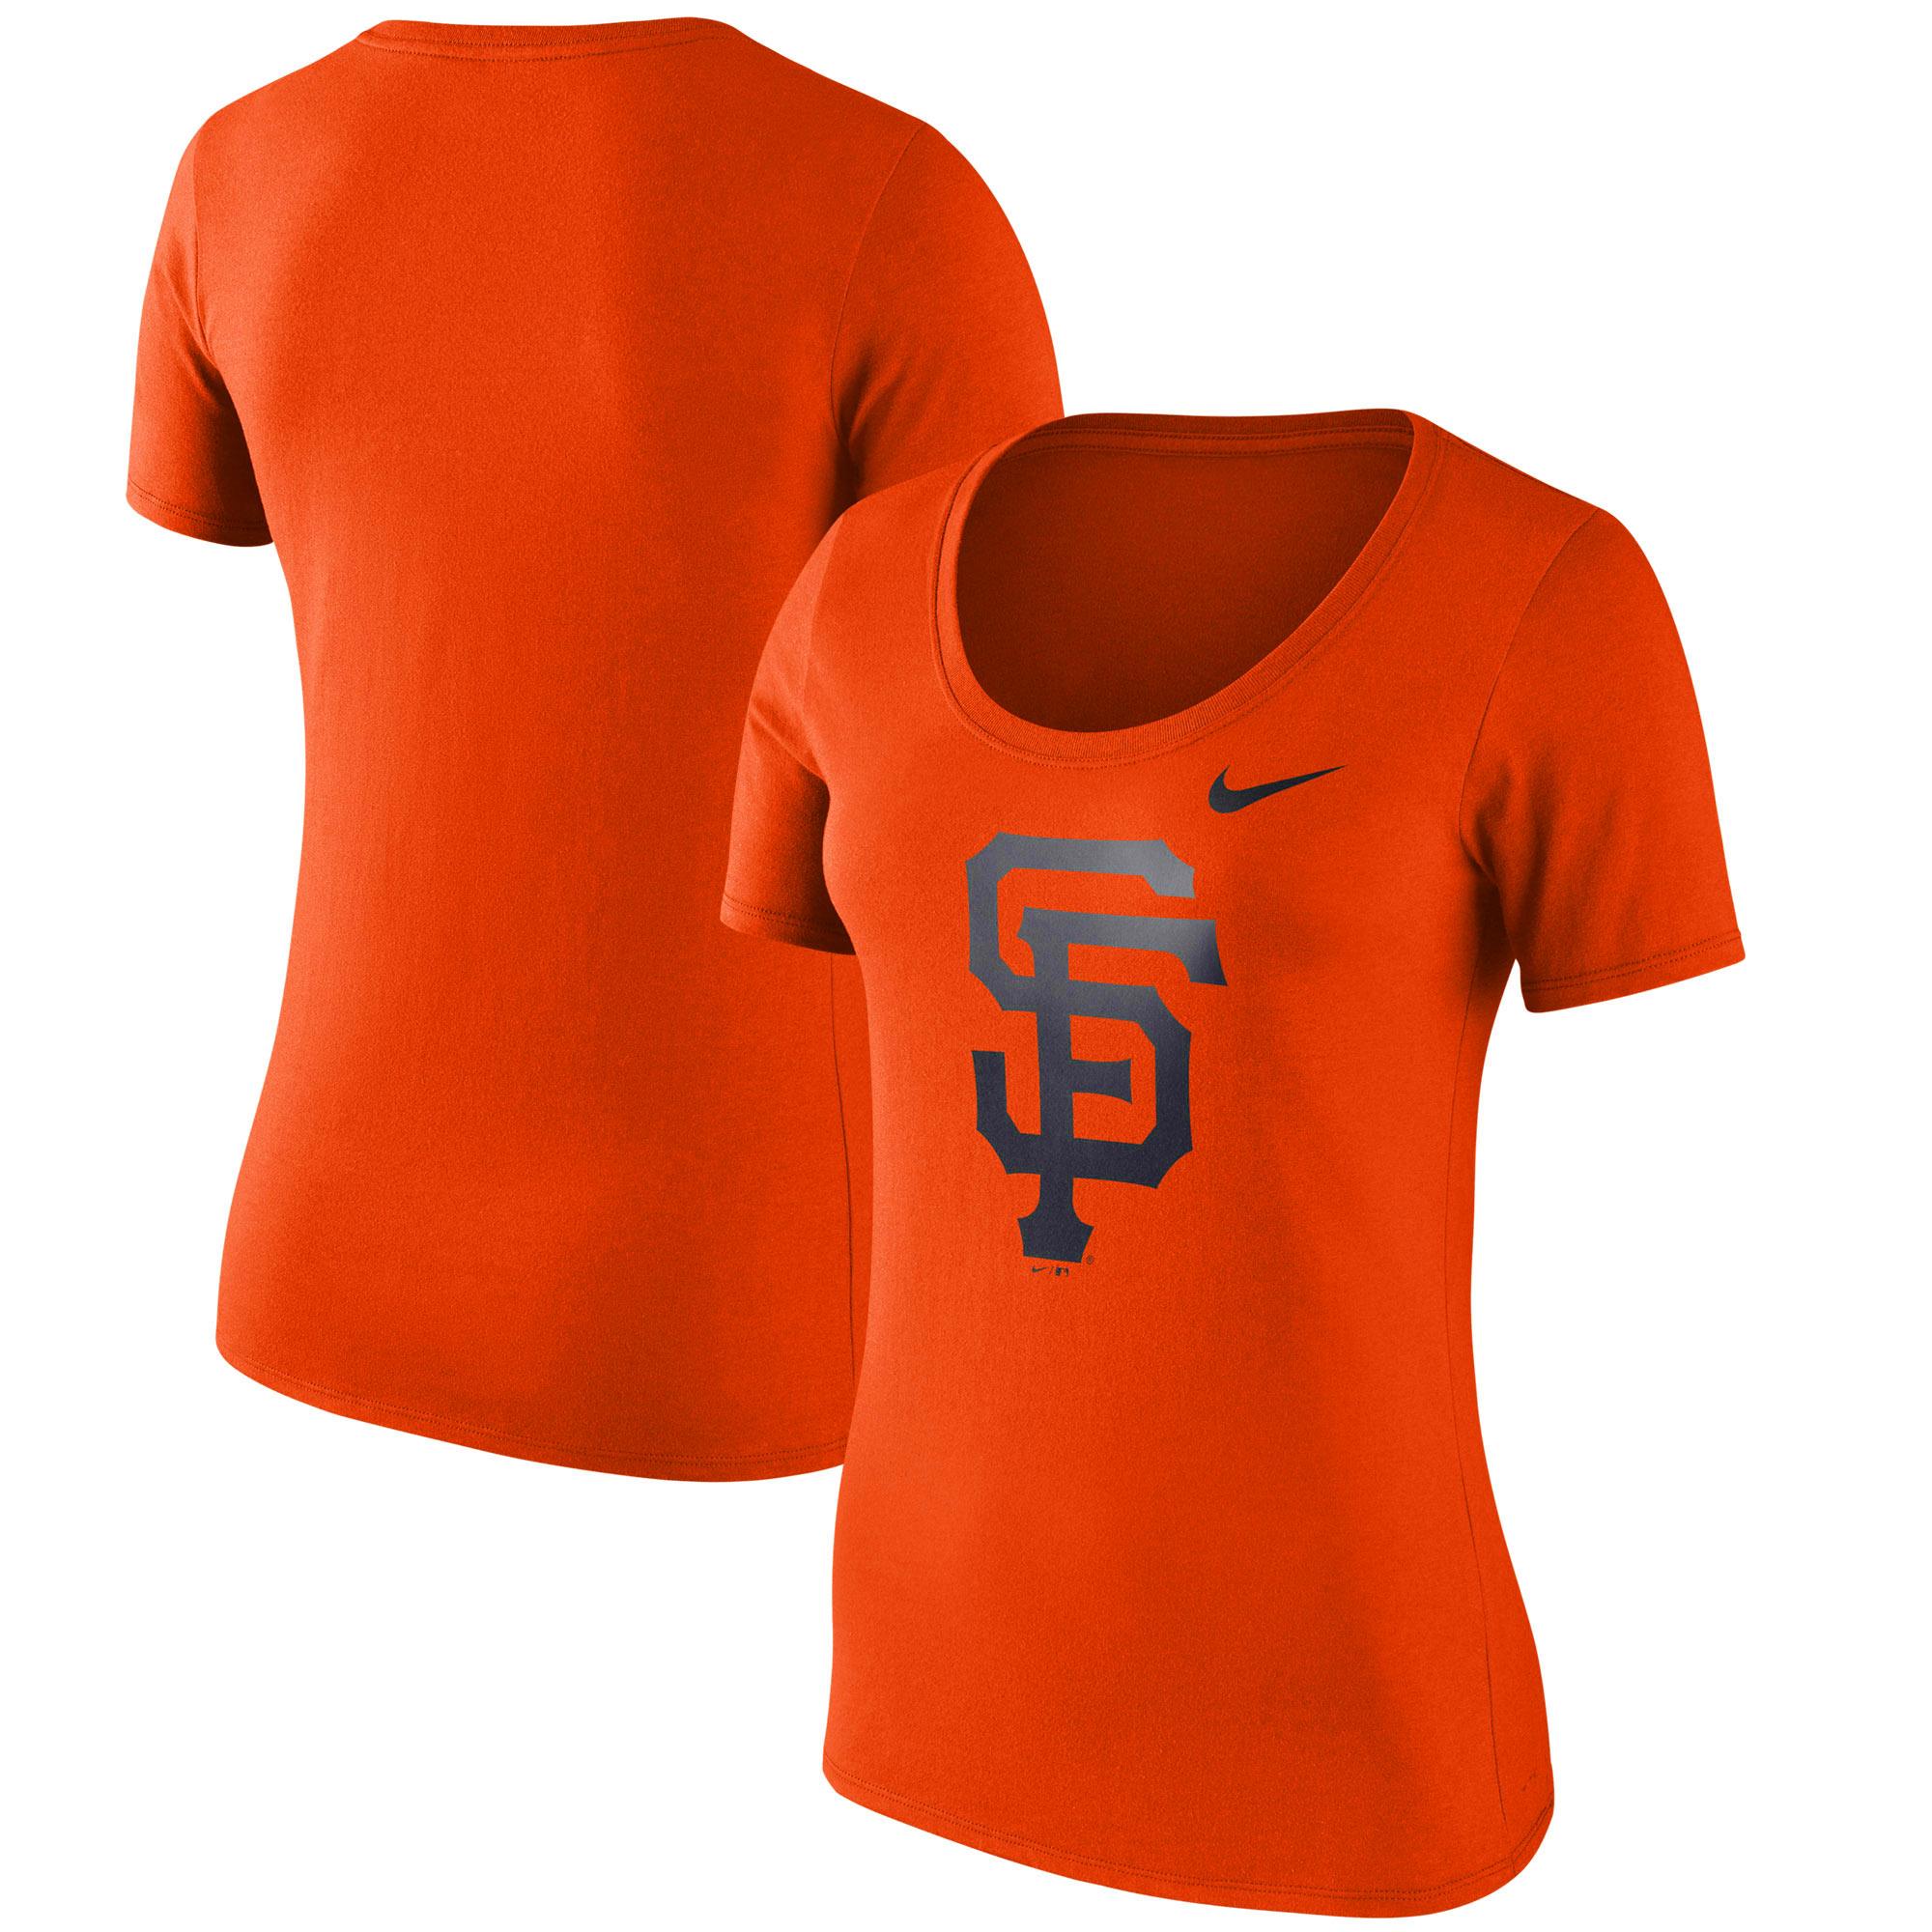 San Francisco Giants Nike Women's Logo Scoop Neck T-Shirt - Orange